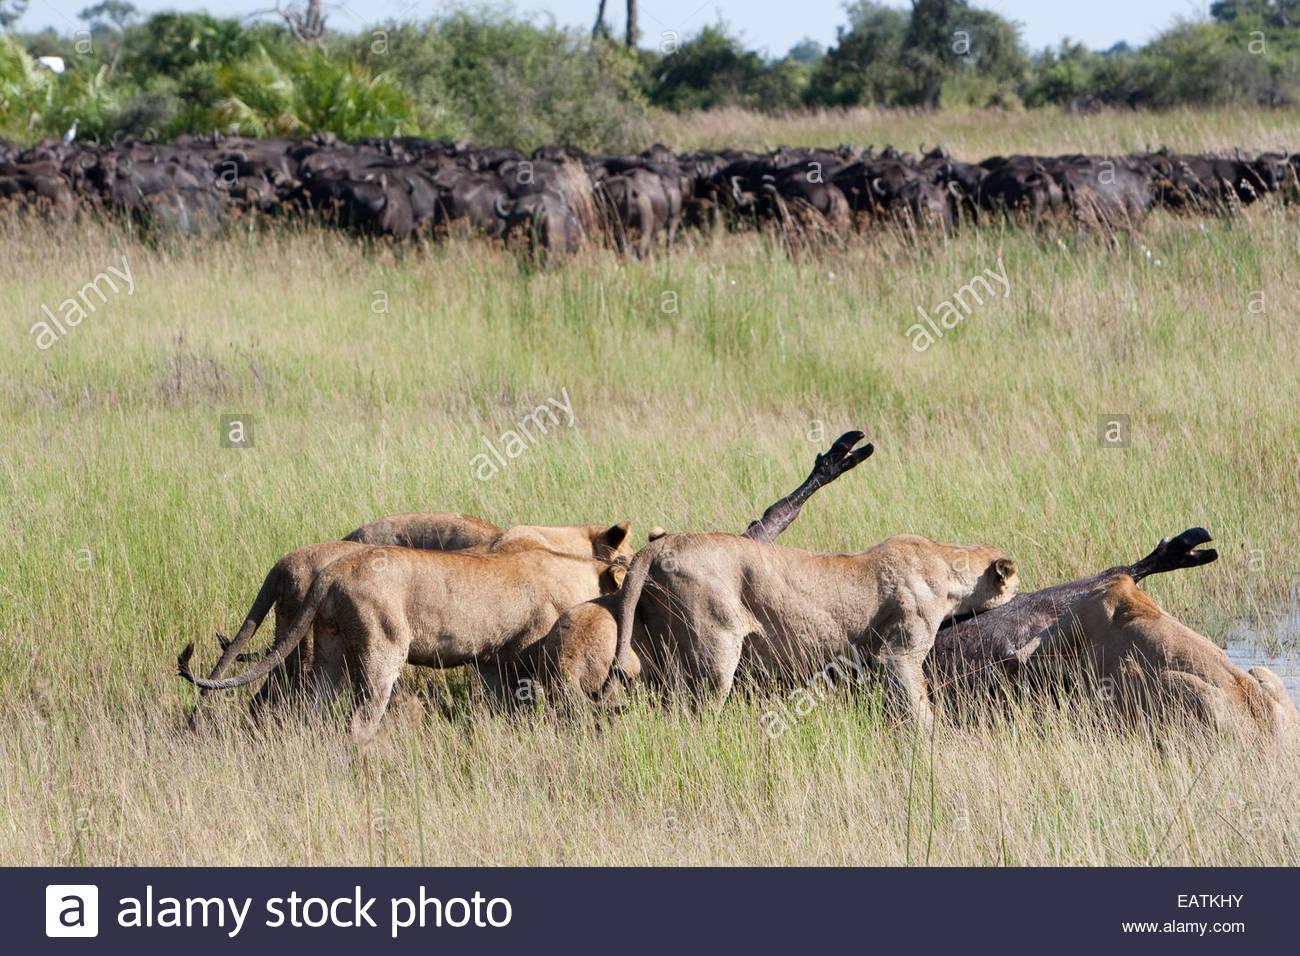 Female South African lions feeding on a freshly killed Cape buffalo. Stock Photo